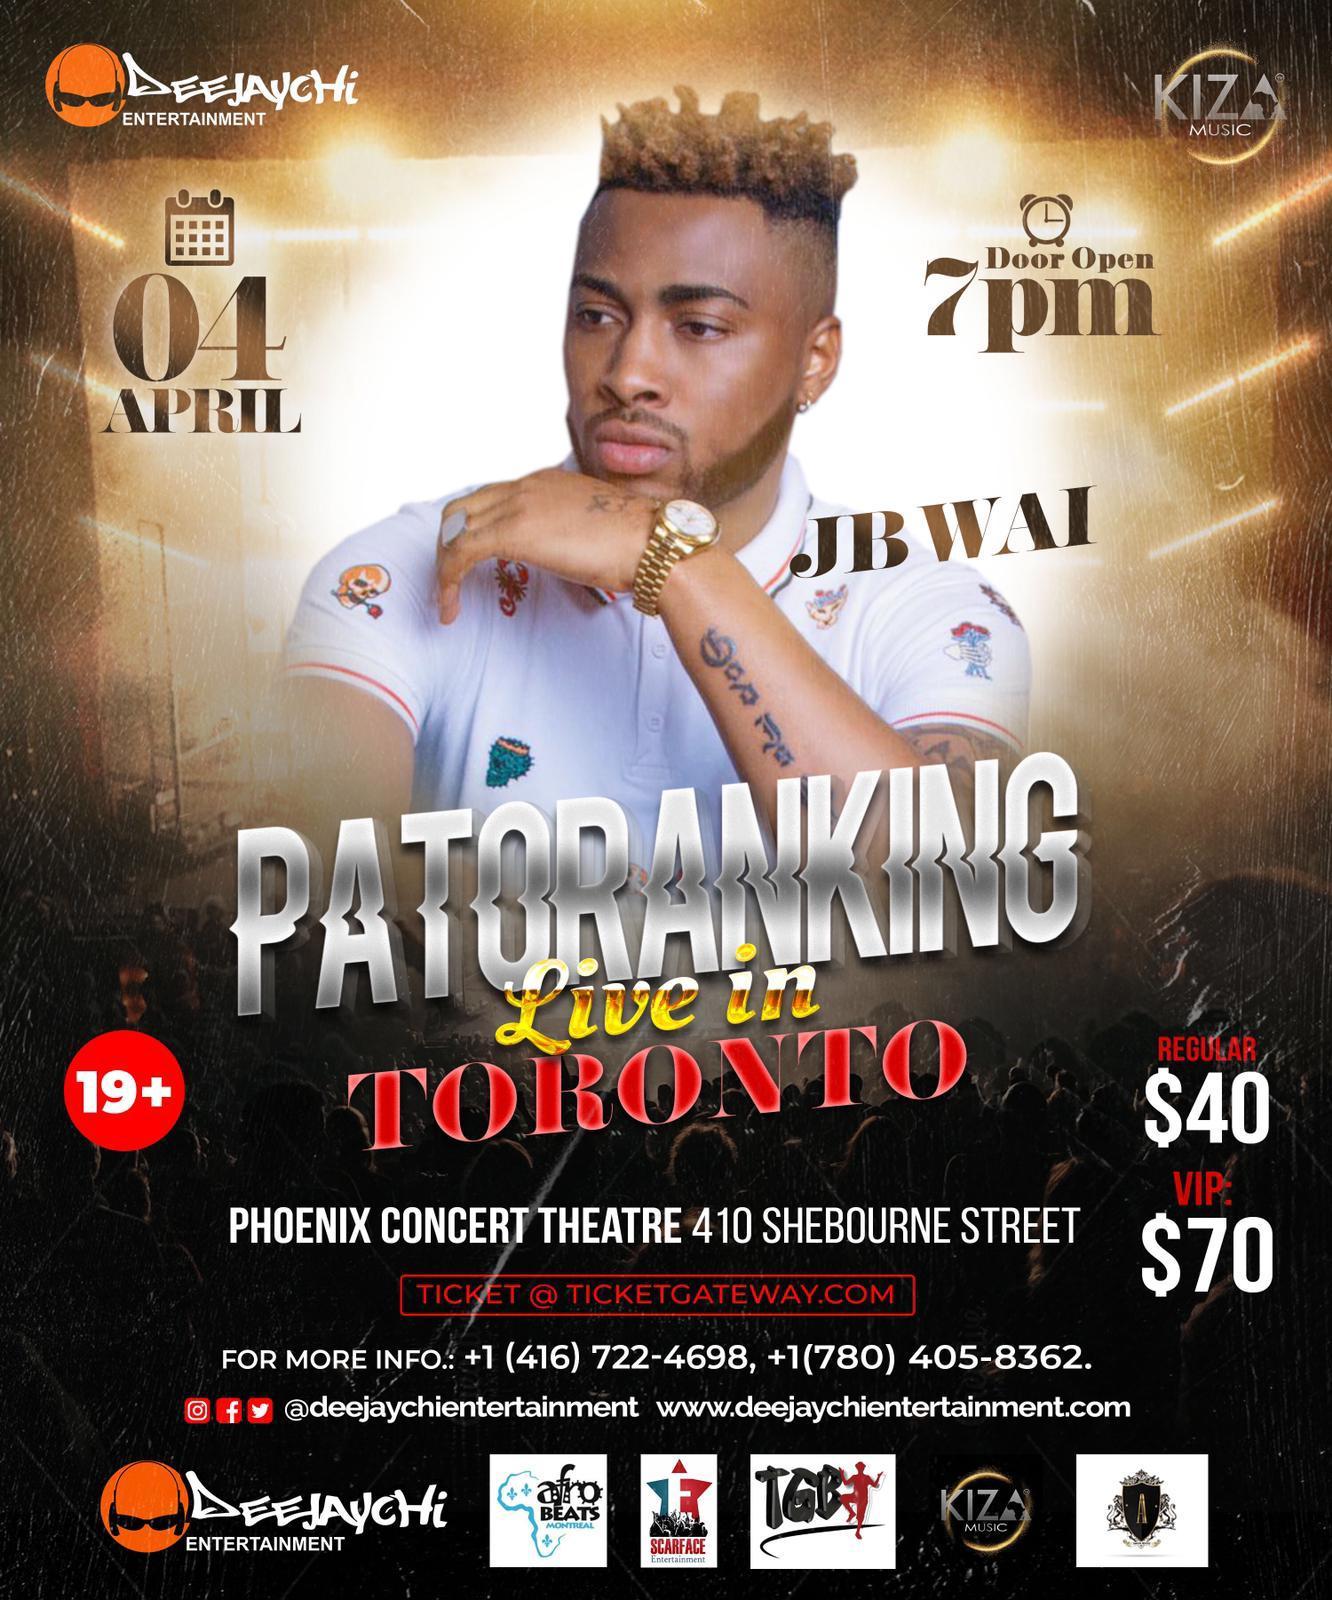 patoranking show